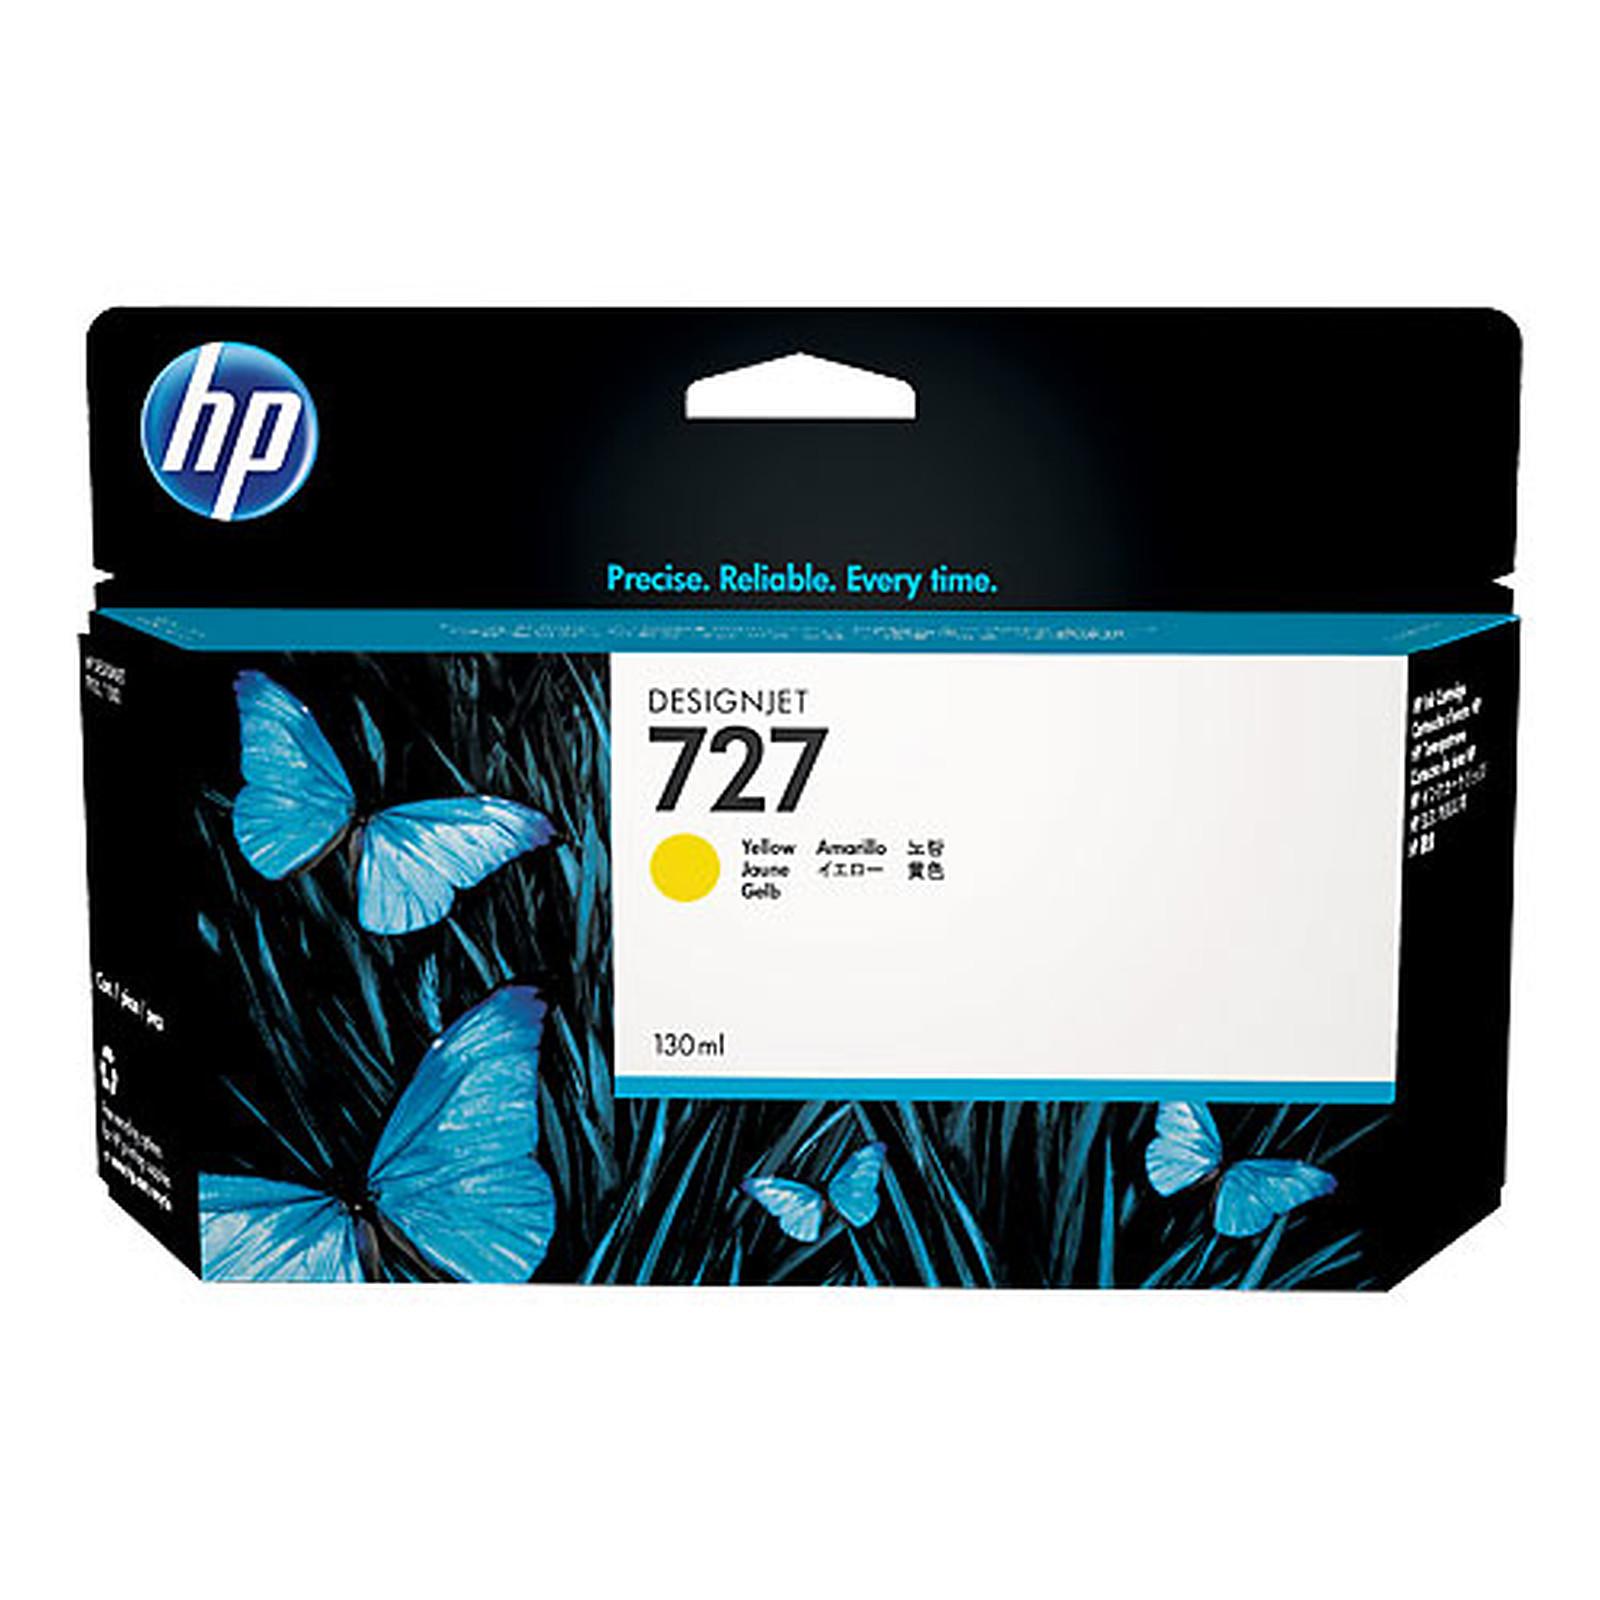 HP 727 Designjet 130 ml - Jaune